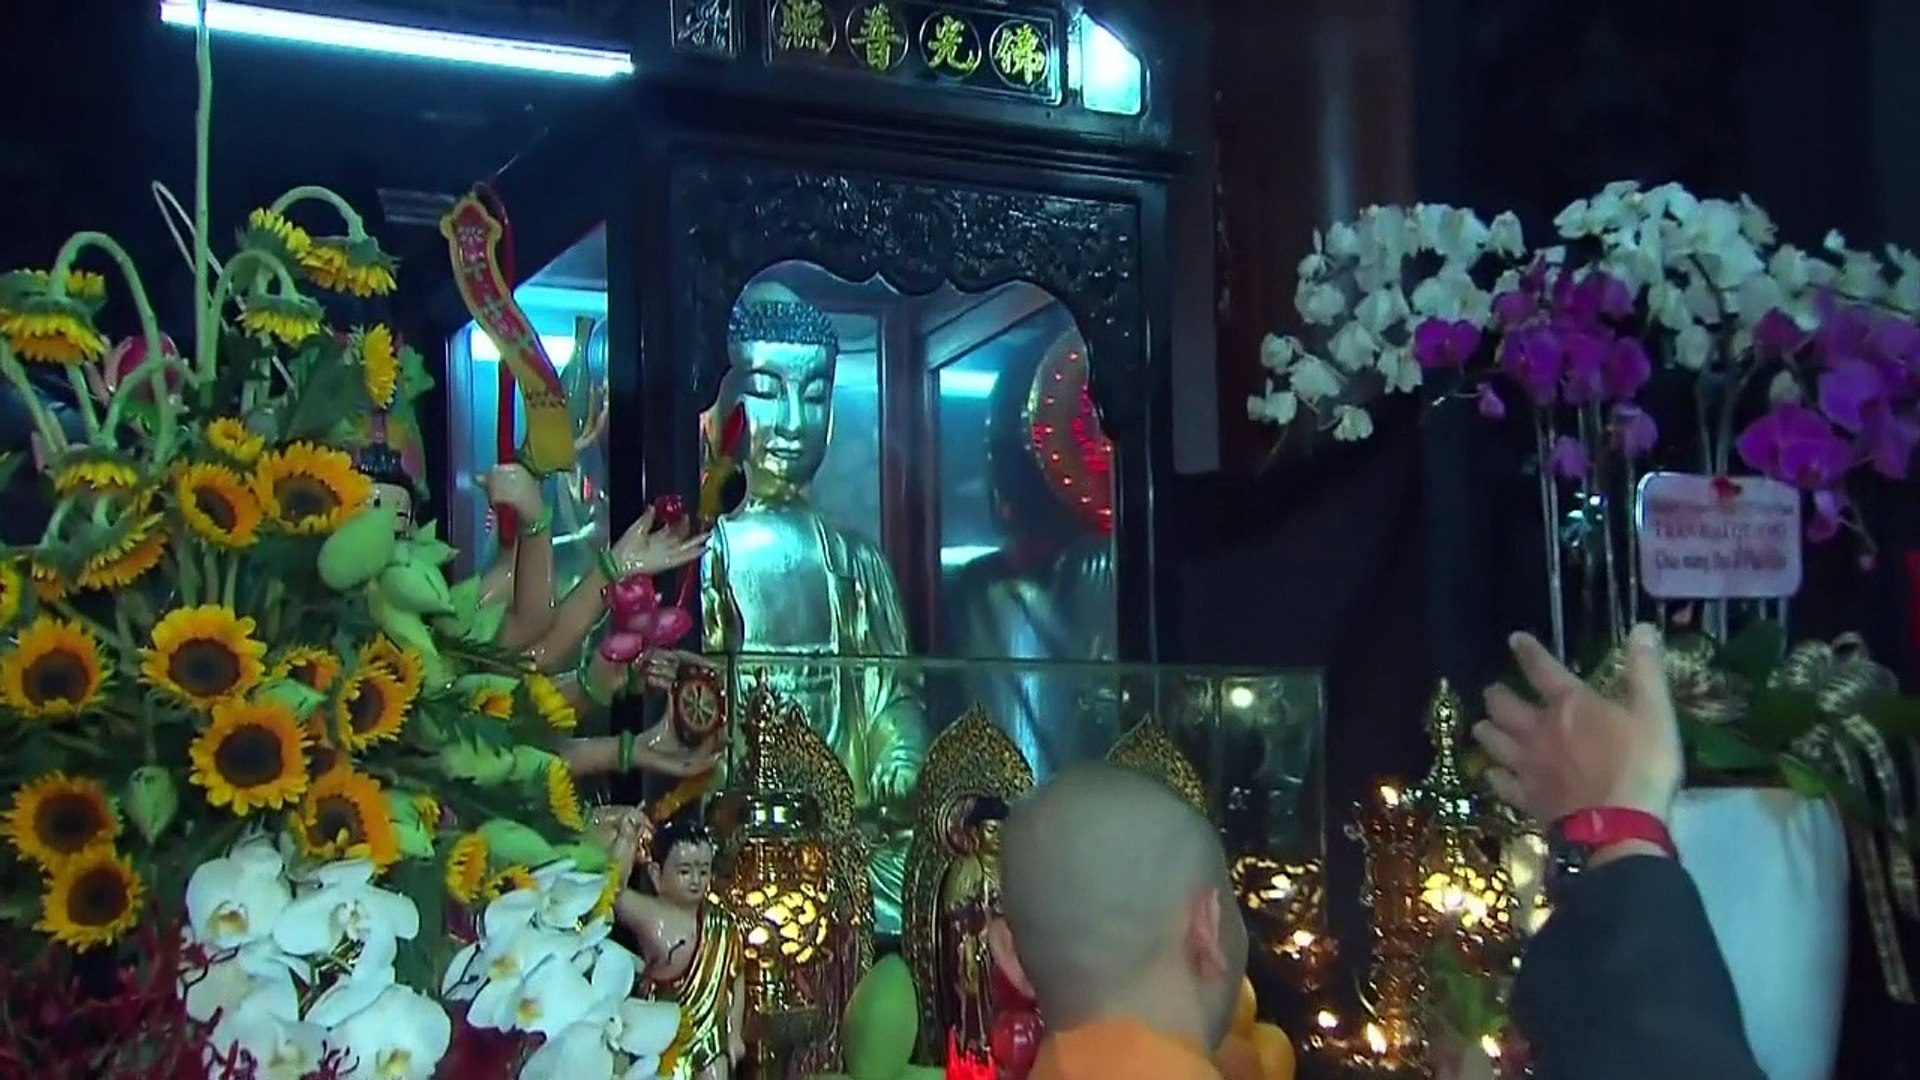 Barack Obama visite la Pagode de l'empereur de Jade au Vietnam